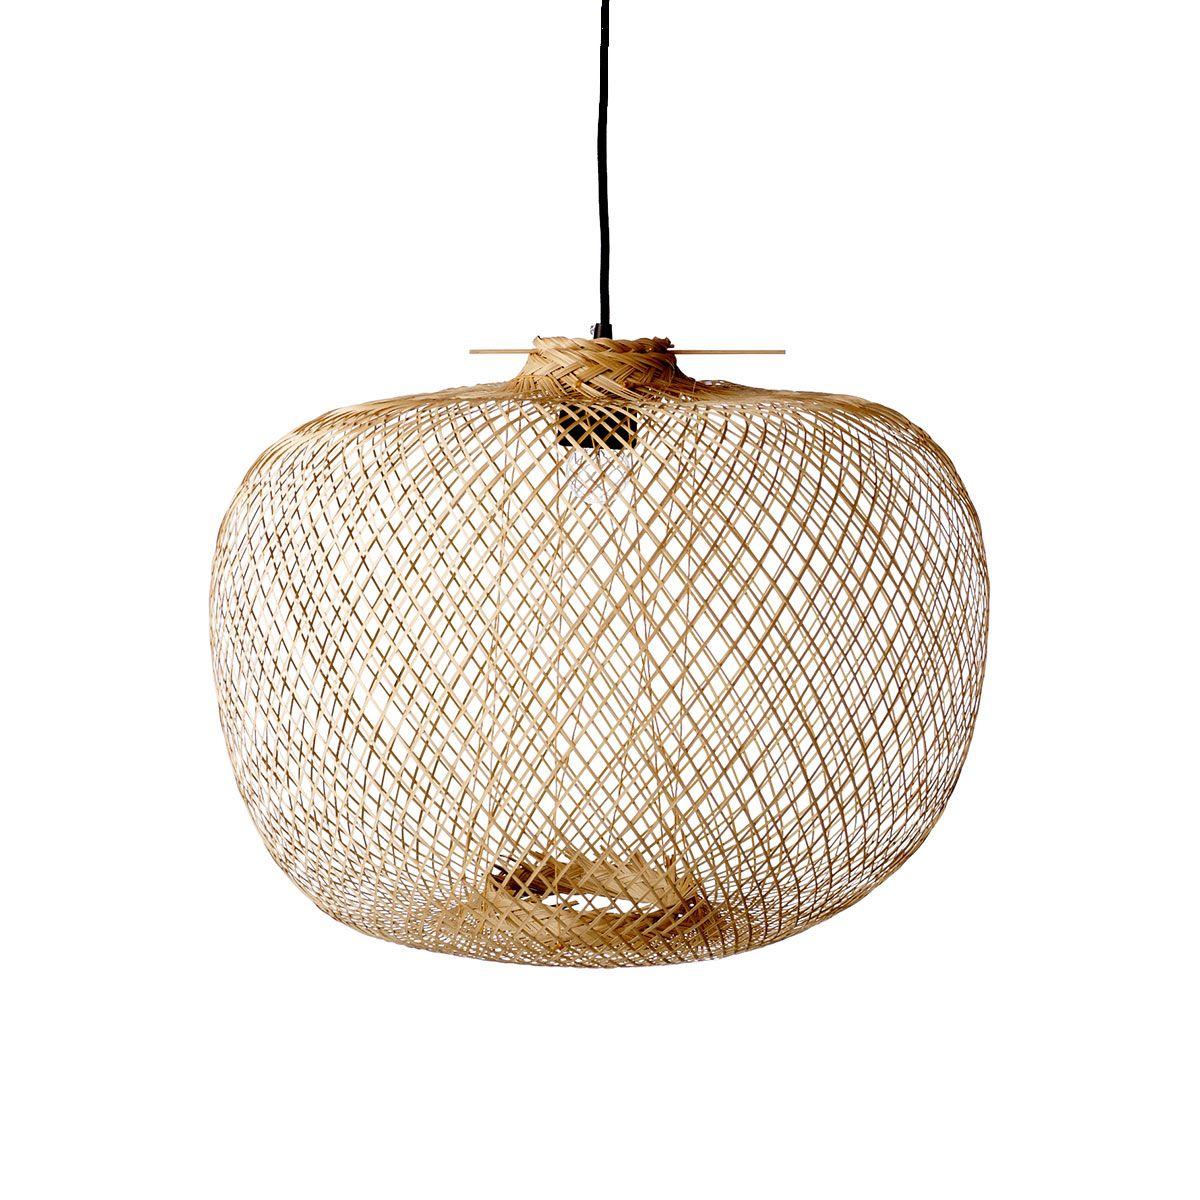 Bloomingville Pendelleuchte Bamboo | Deko Wohnen | Pinterest ...